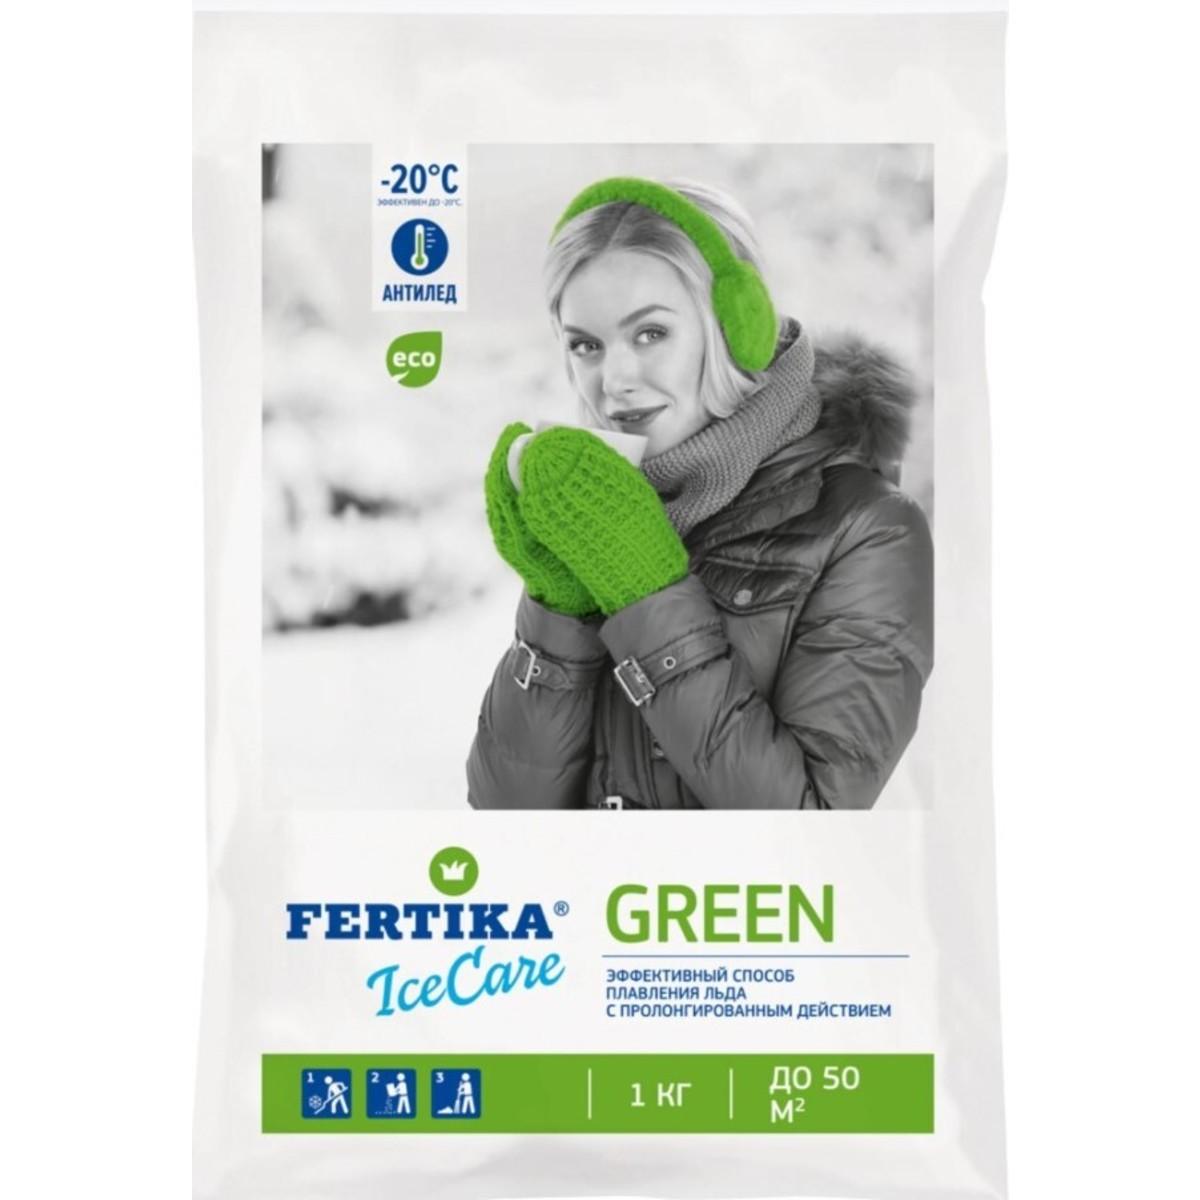 Противогололедный реагент Фертика Icecare Green 1 кг